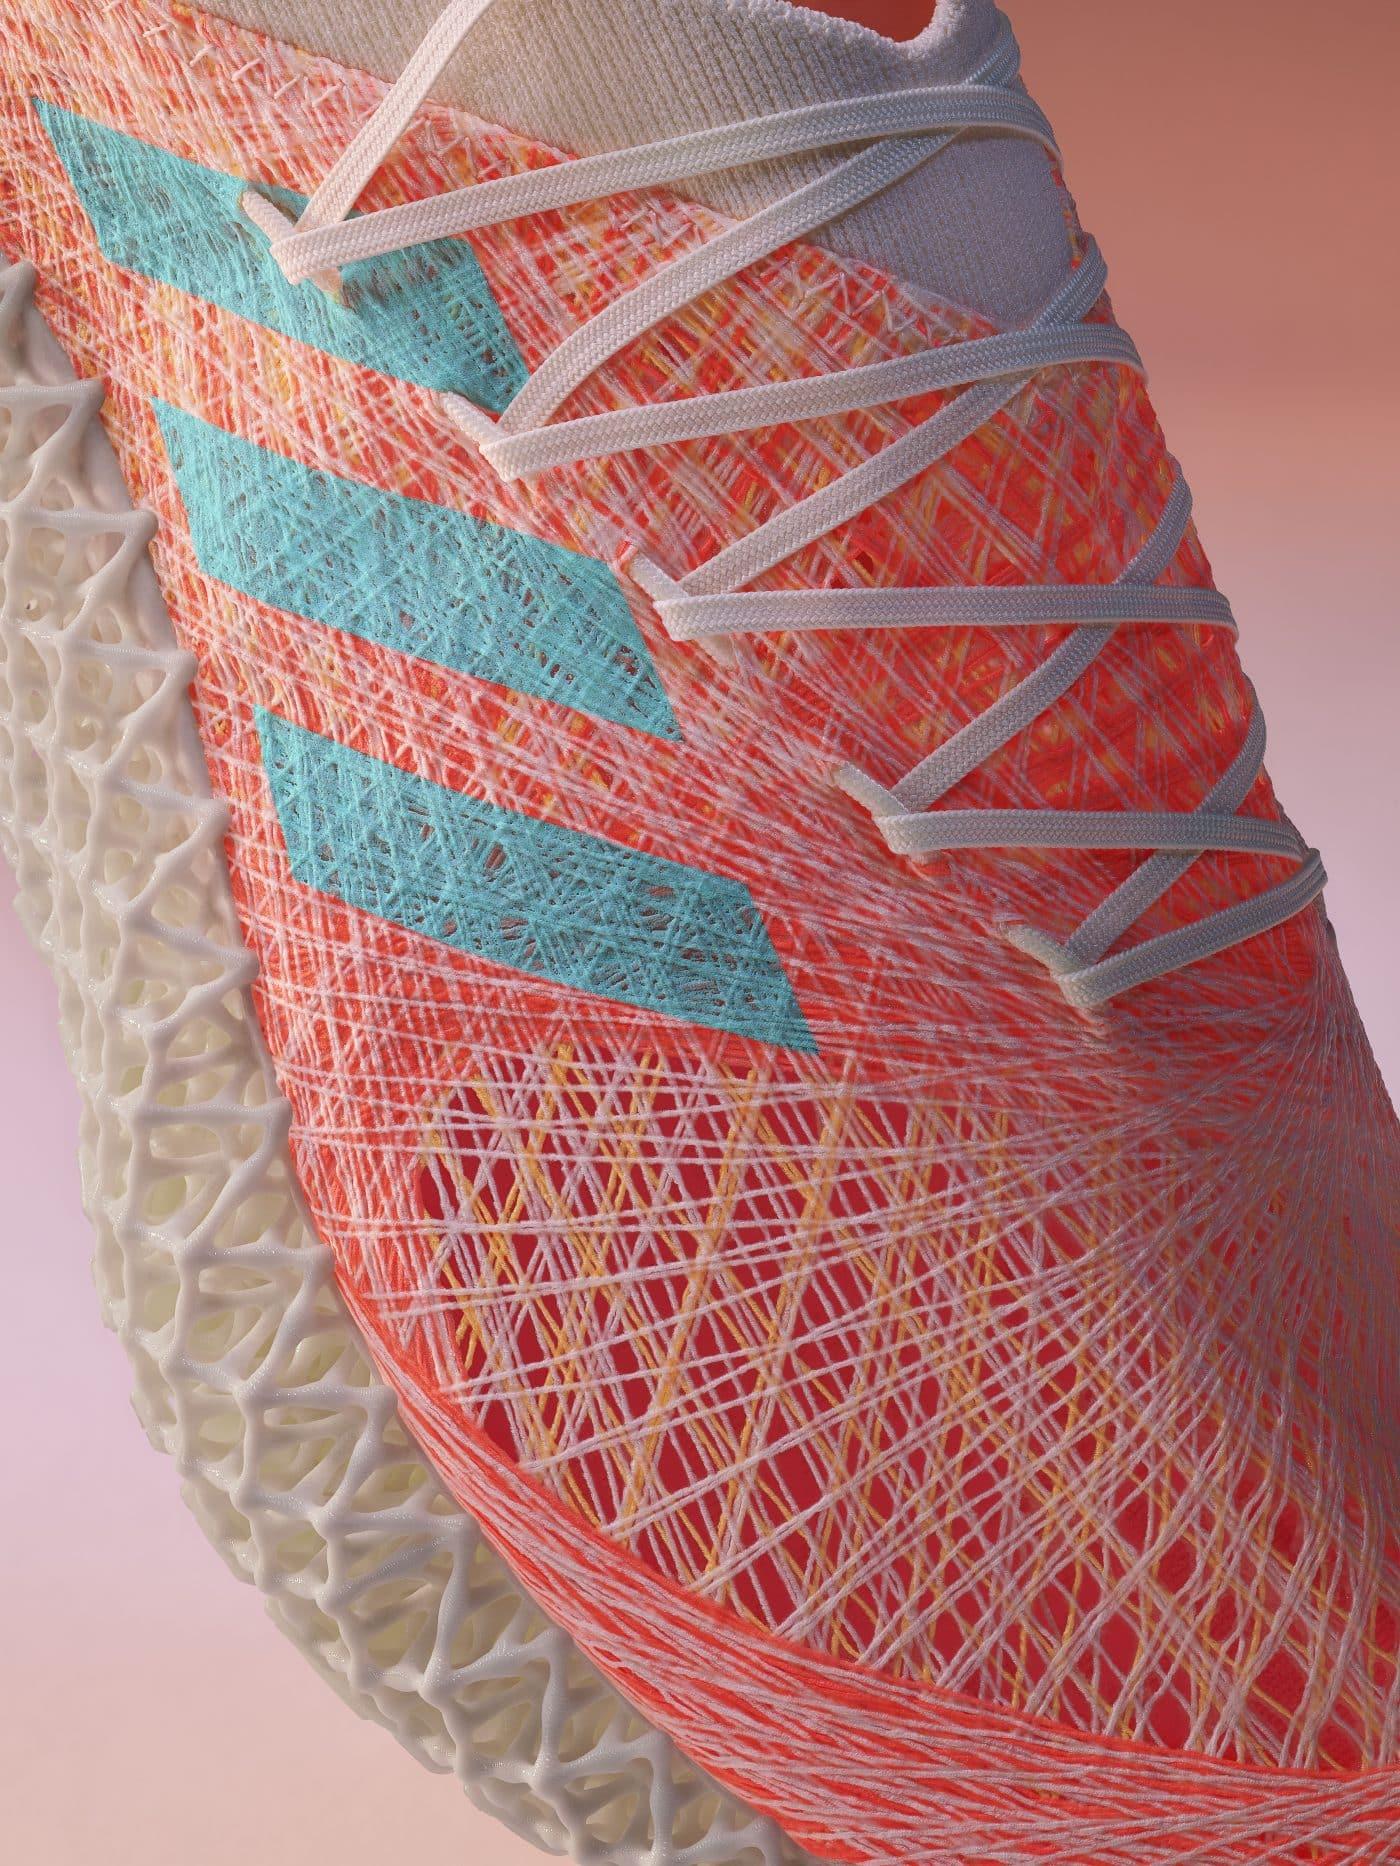 adidas_futurecraft_strung_7